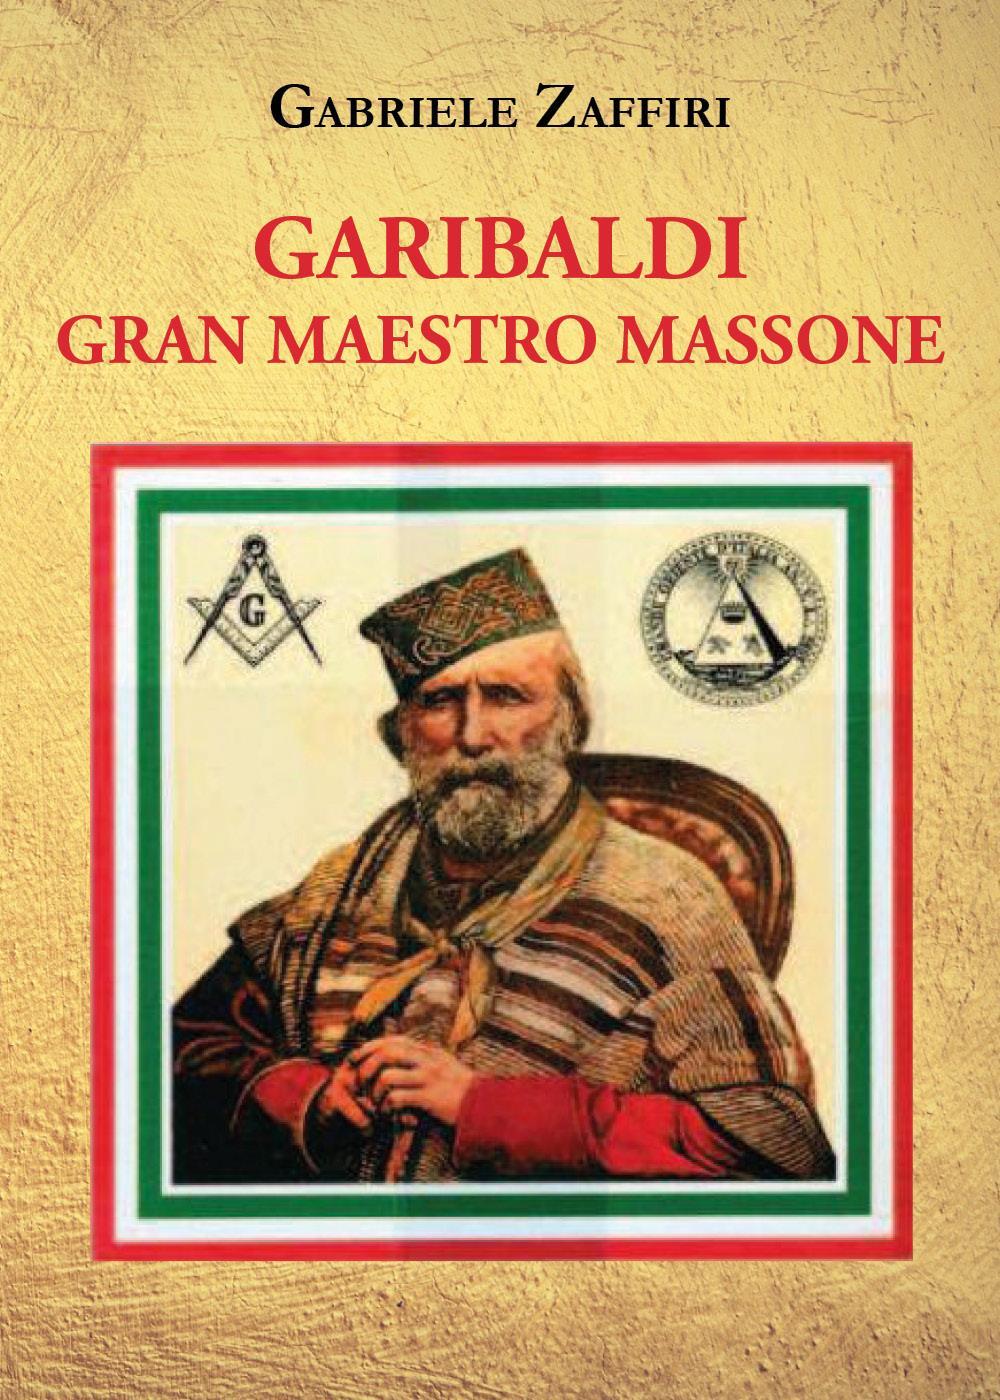 Garibaldi Gran Maestro Massone